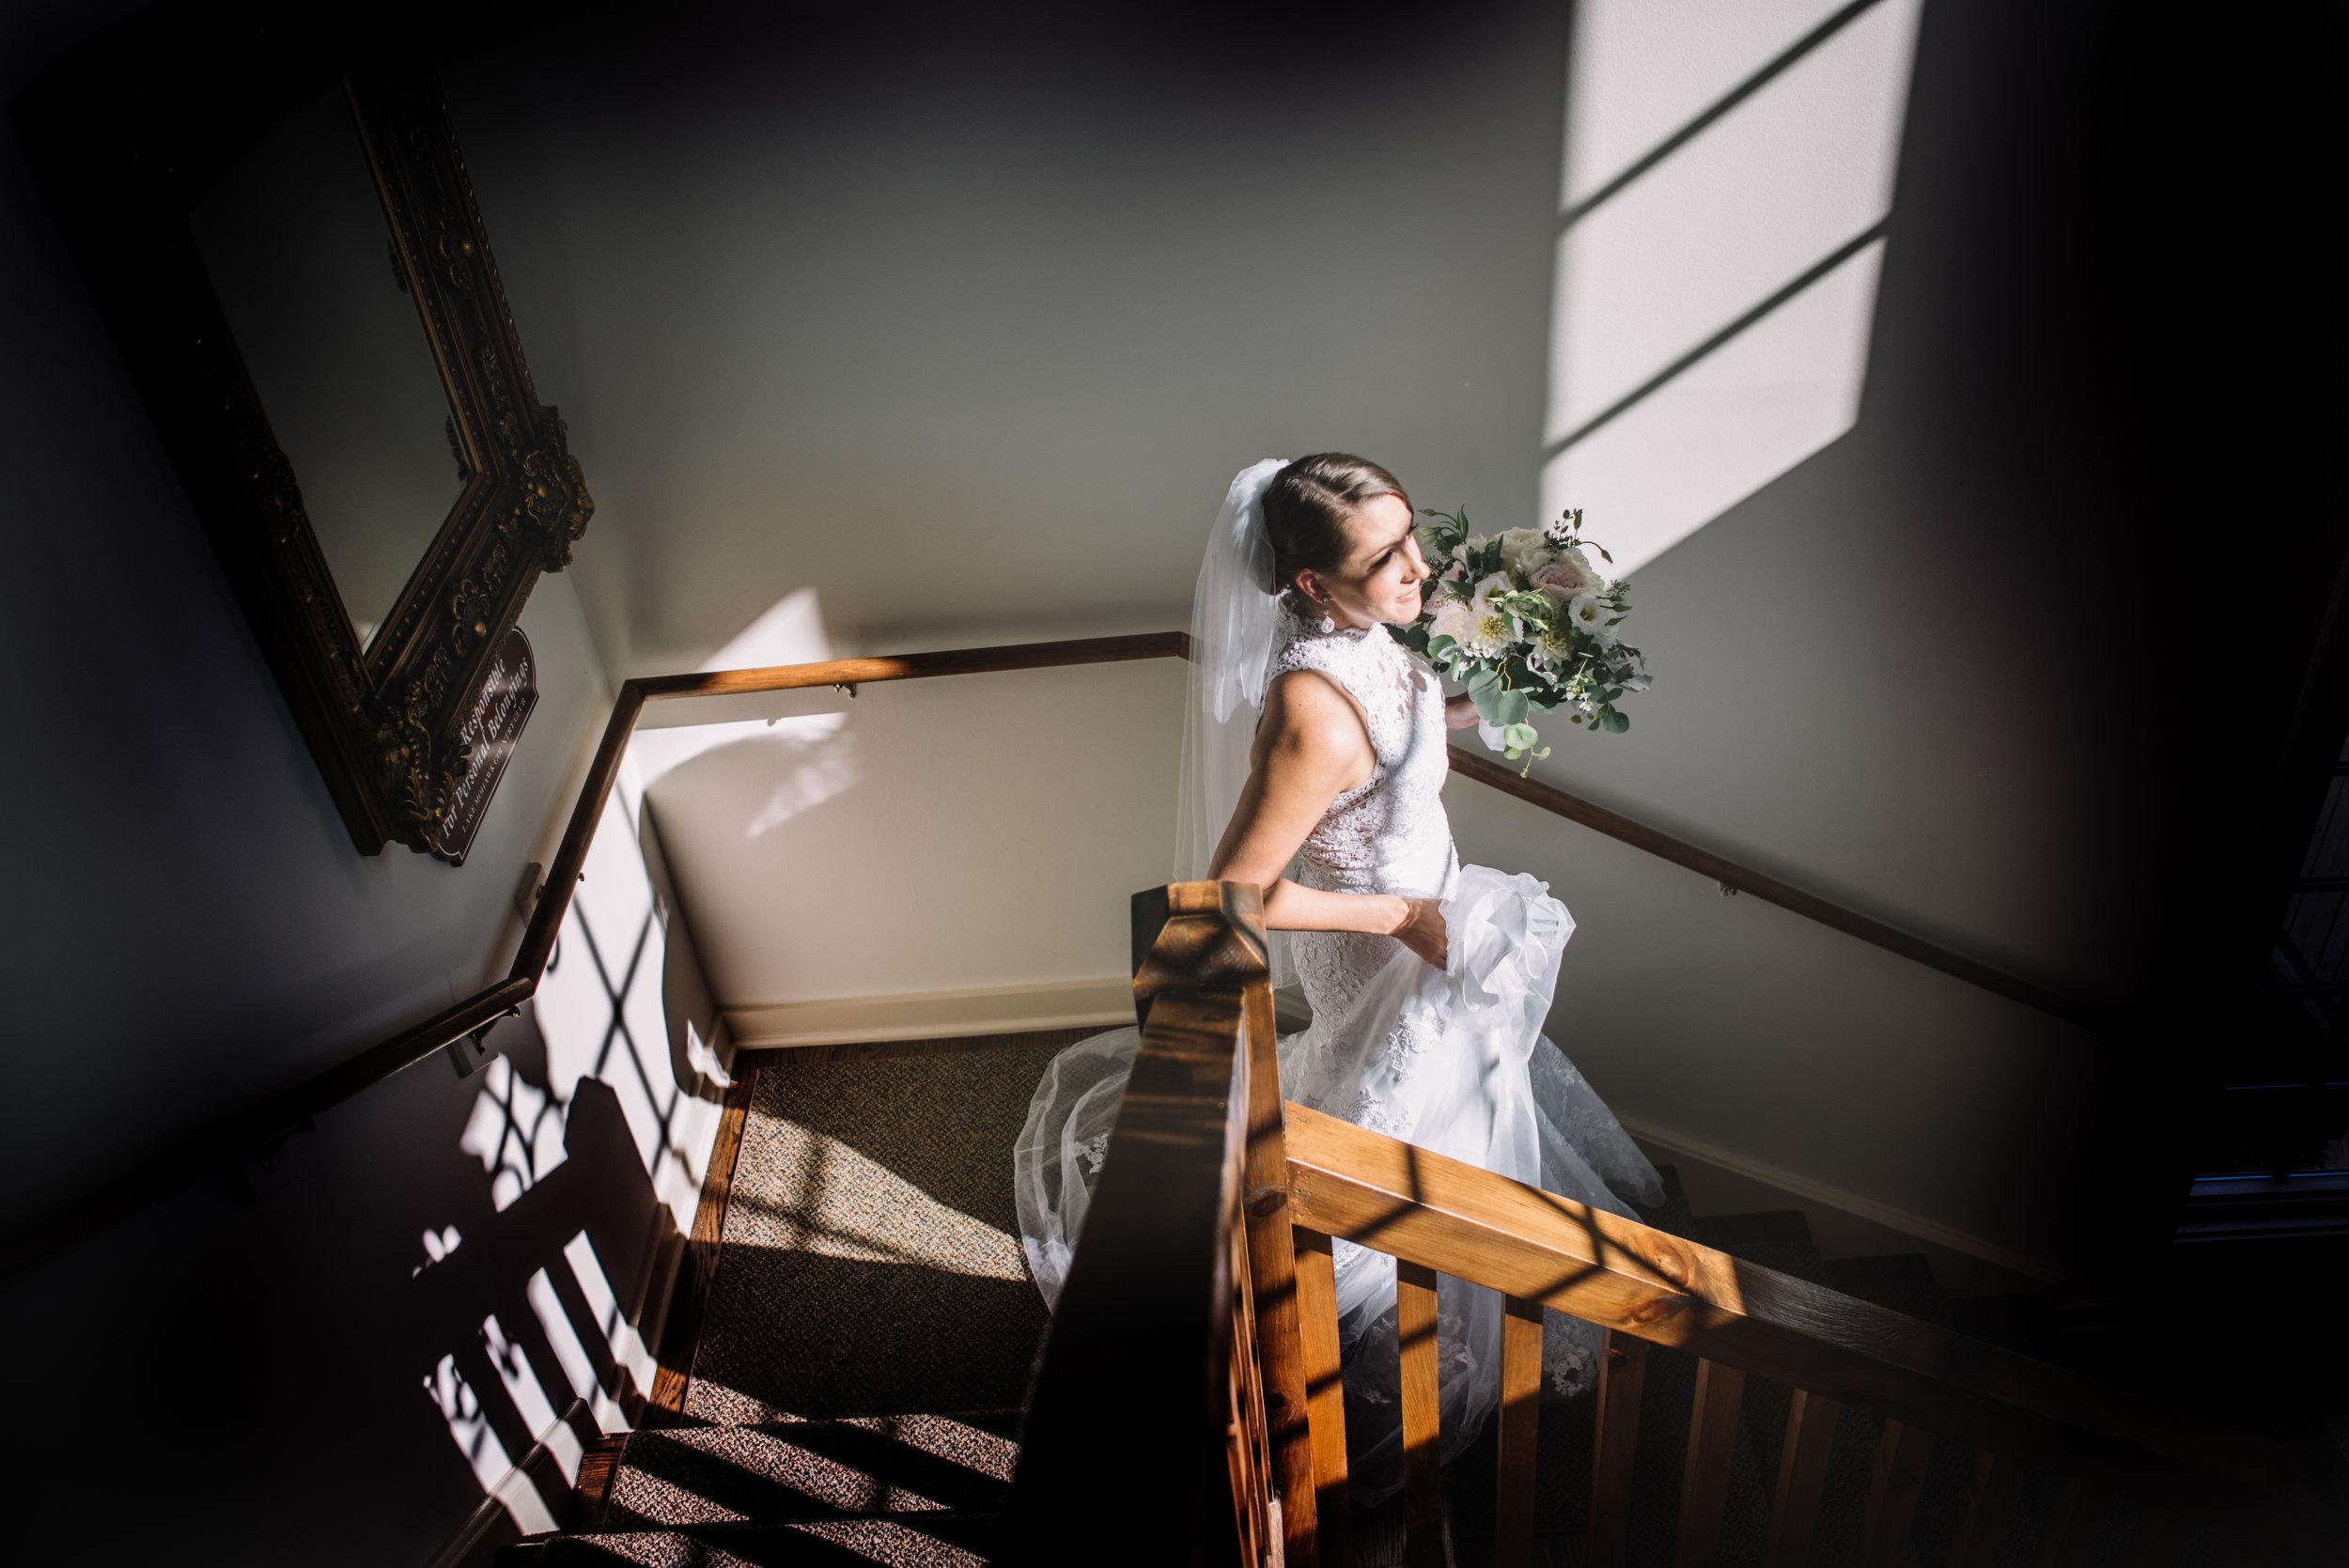 WeddingPhotos | NJPhotographer | Highlights-5-26.jpg